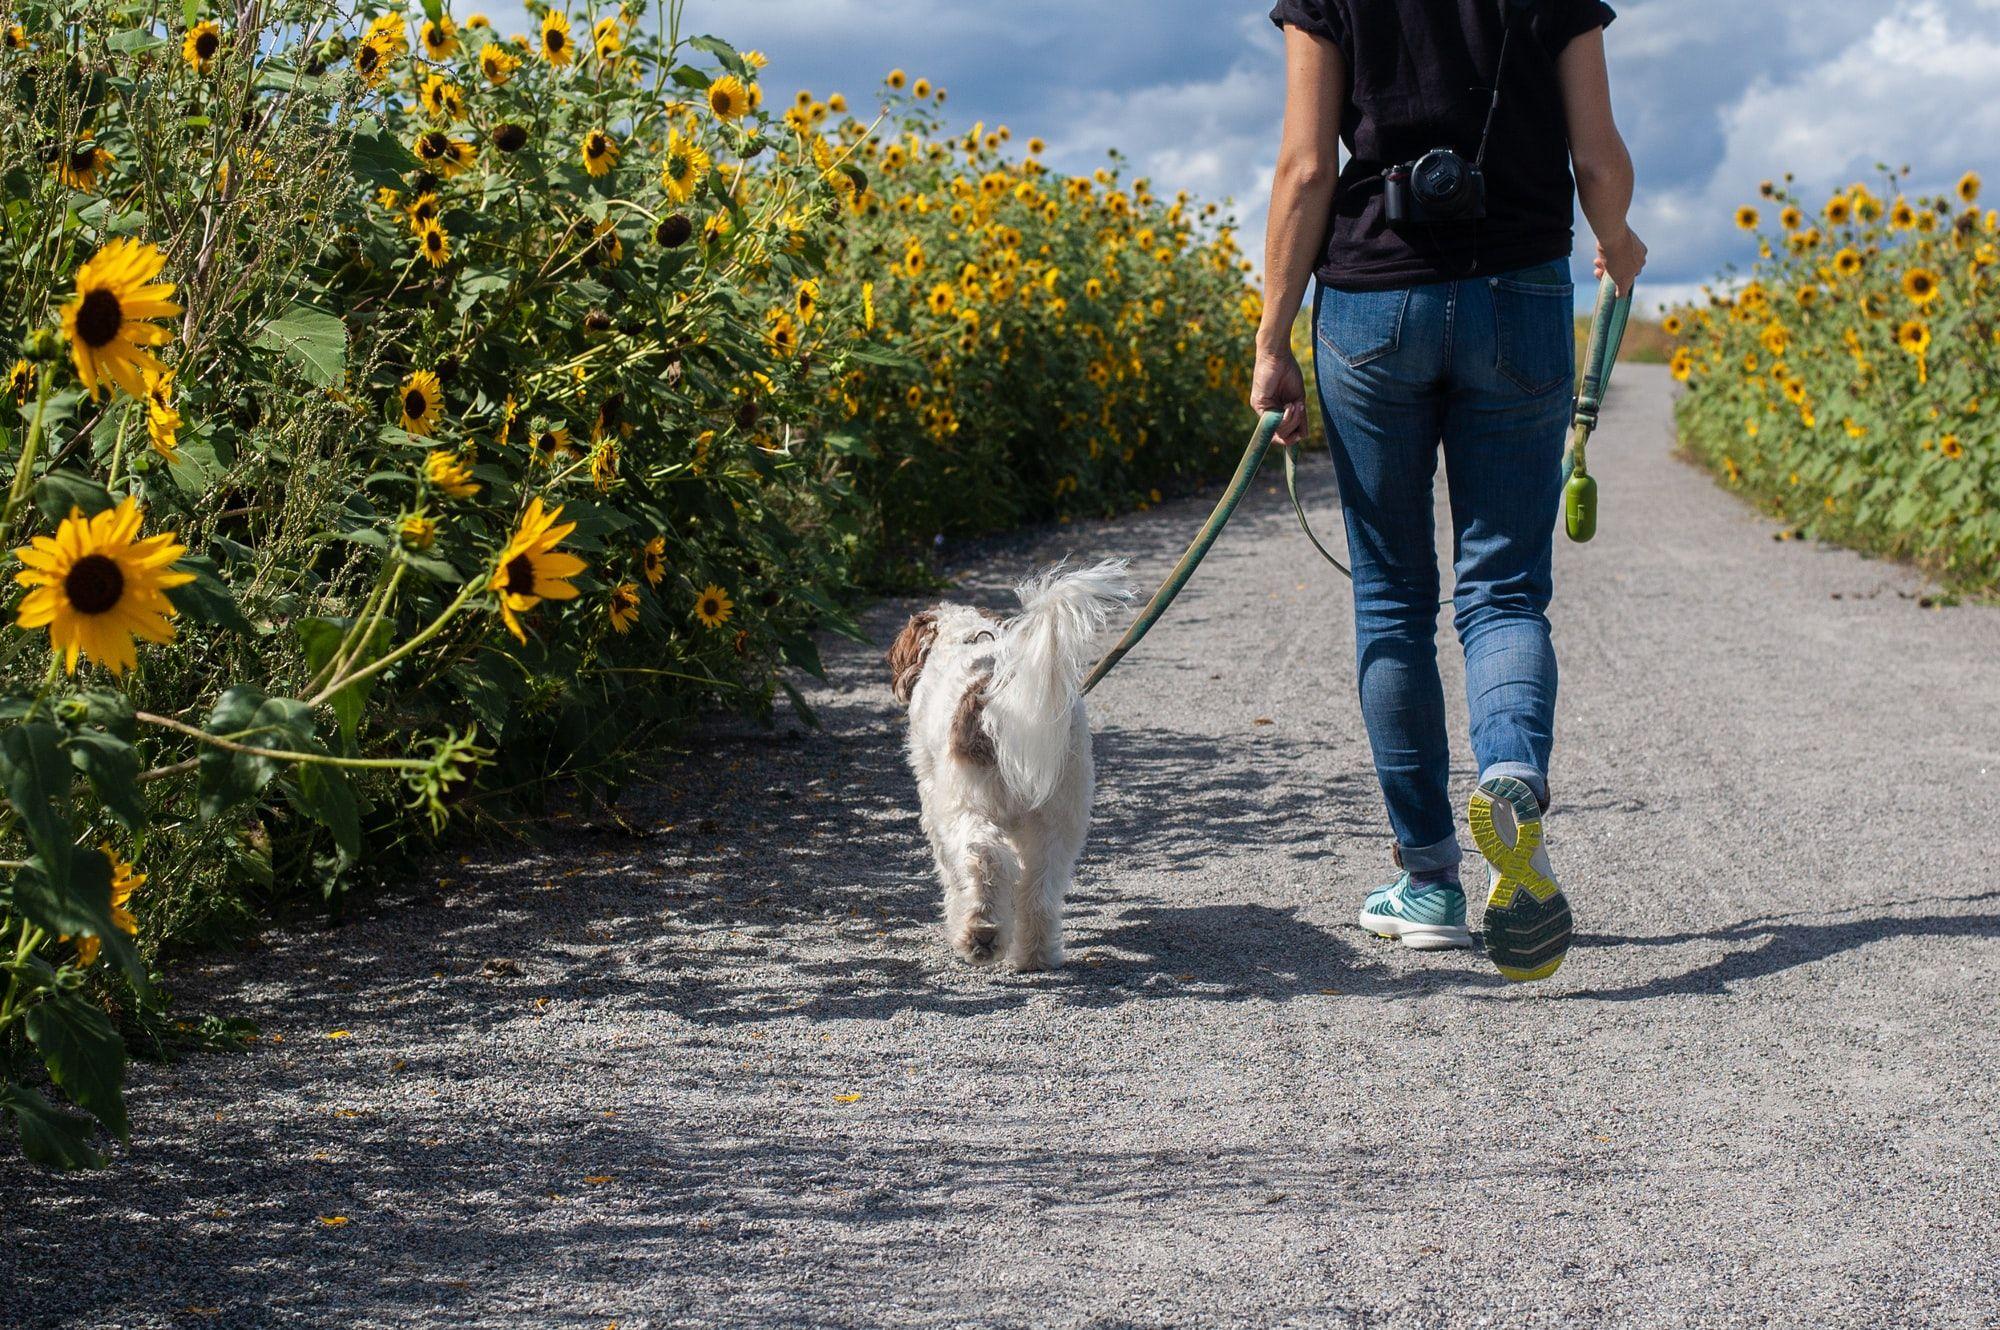 Dog Training with Or: Teaching Loose Leash Walking